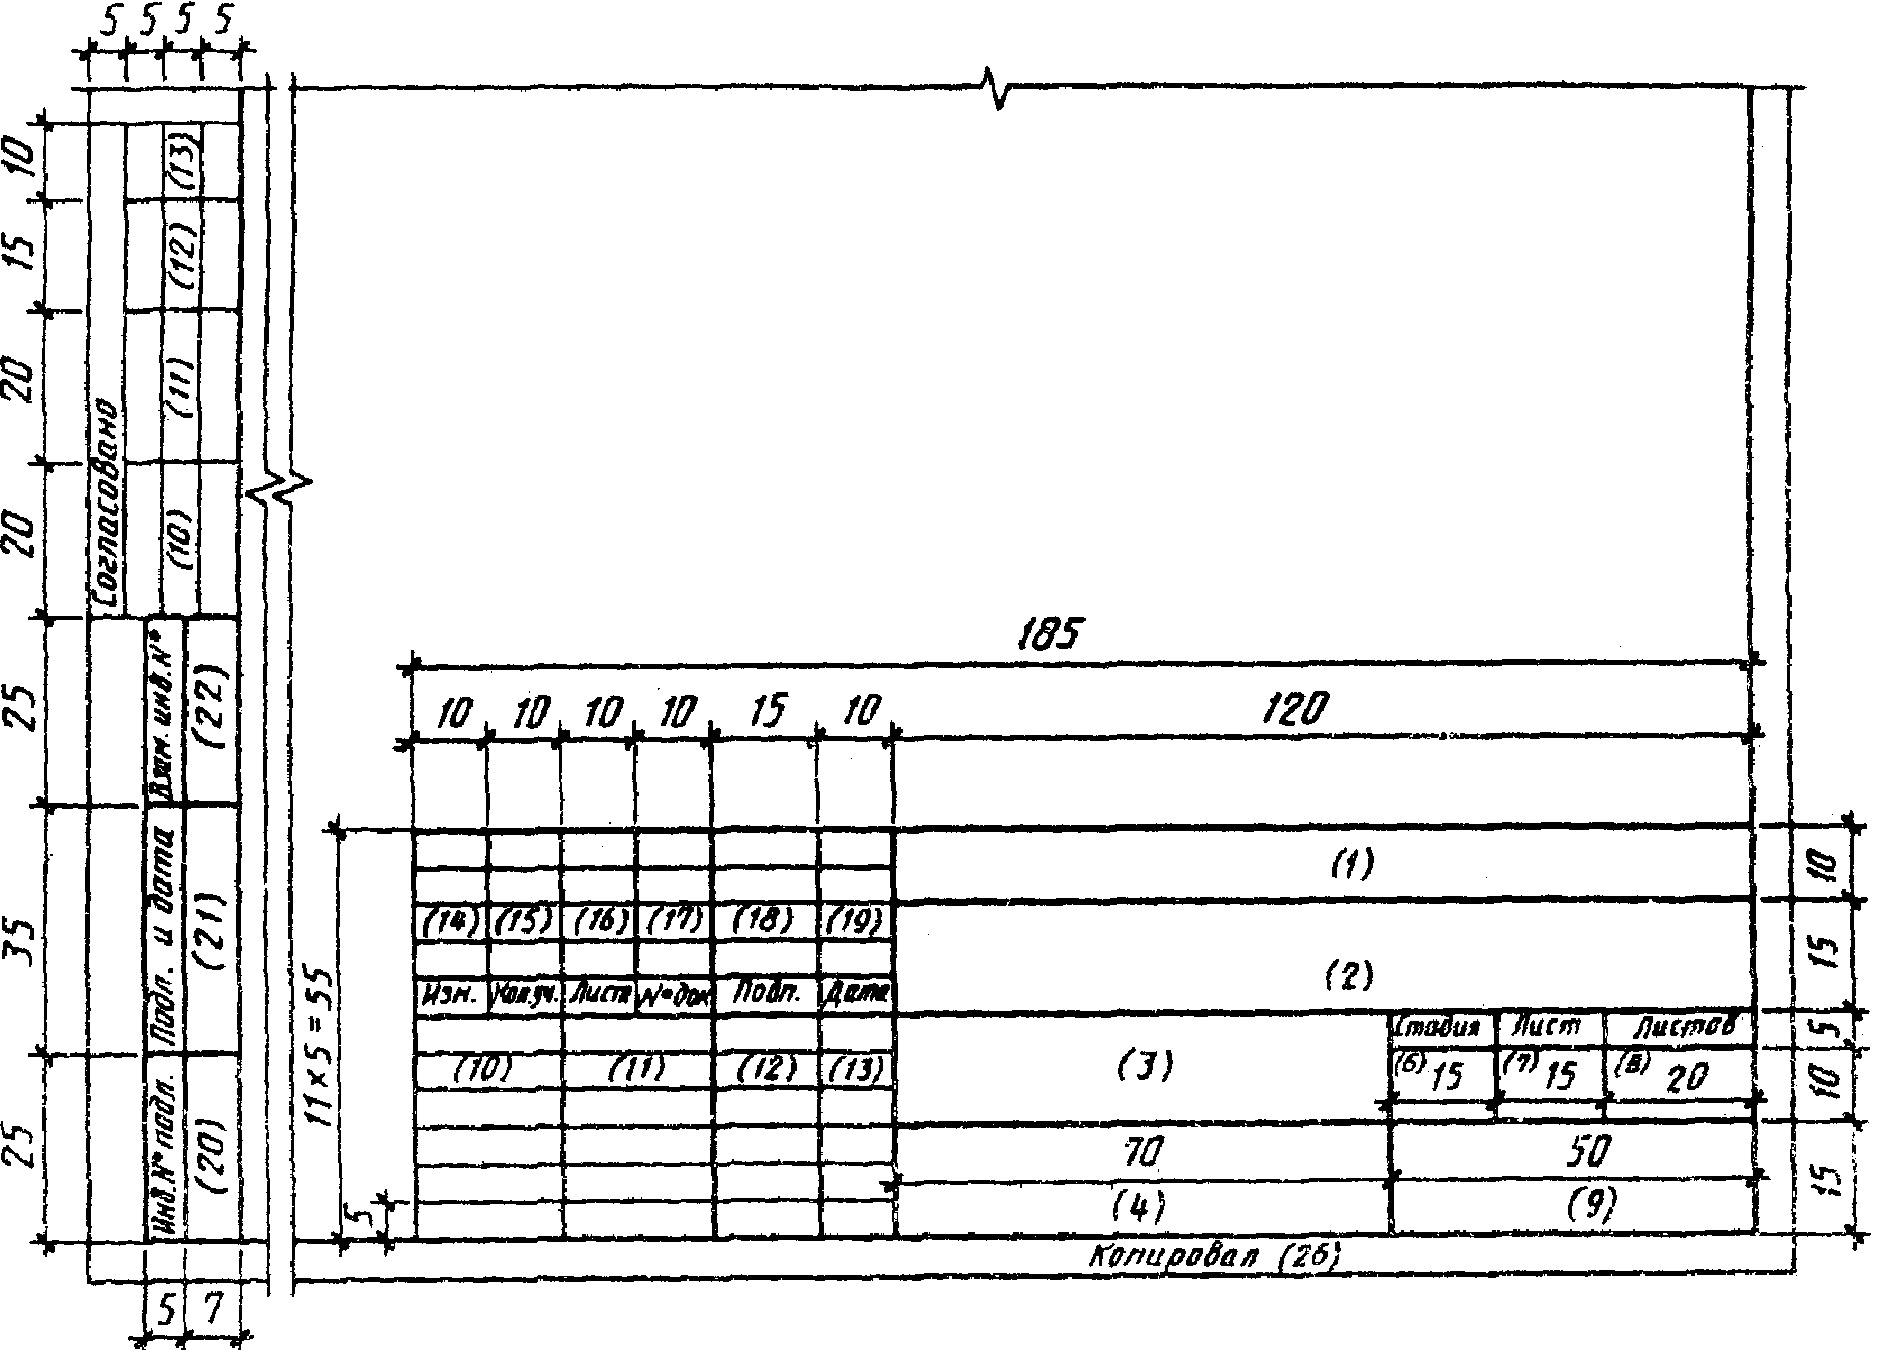 топливо чертежный штамп для а3 база предложений